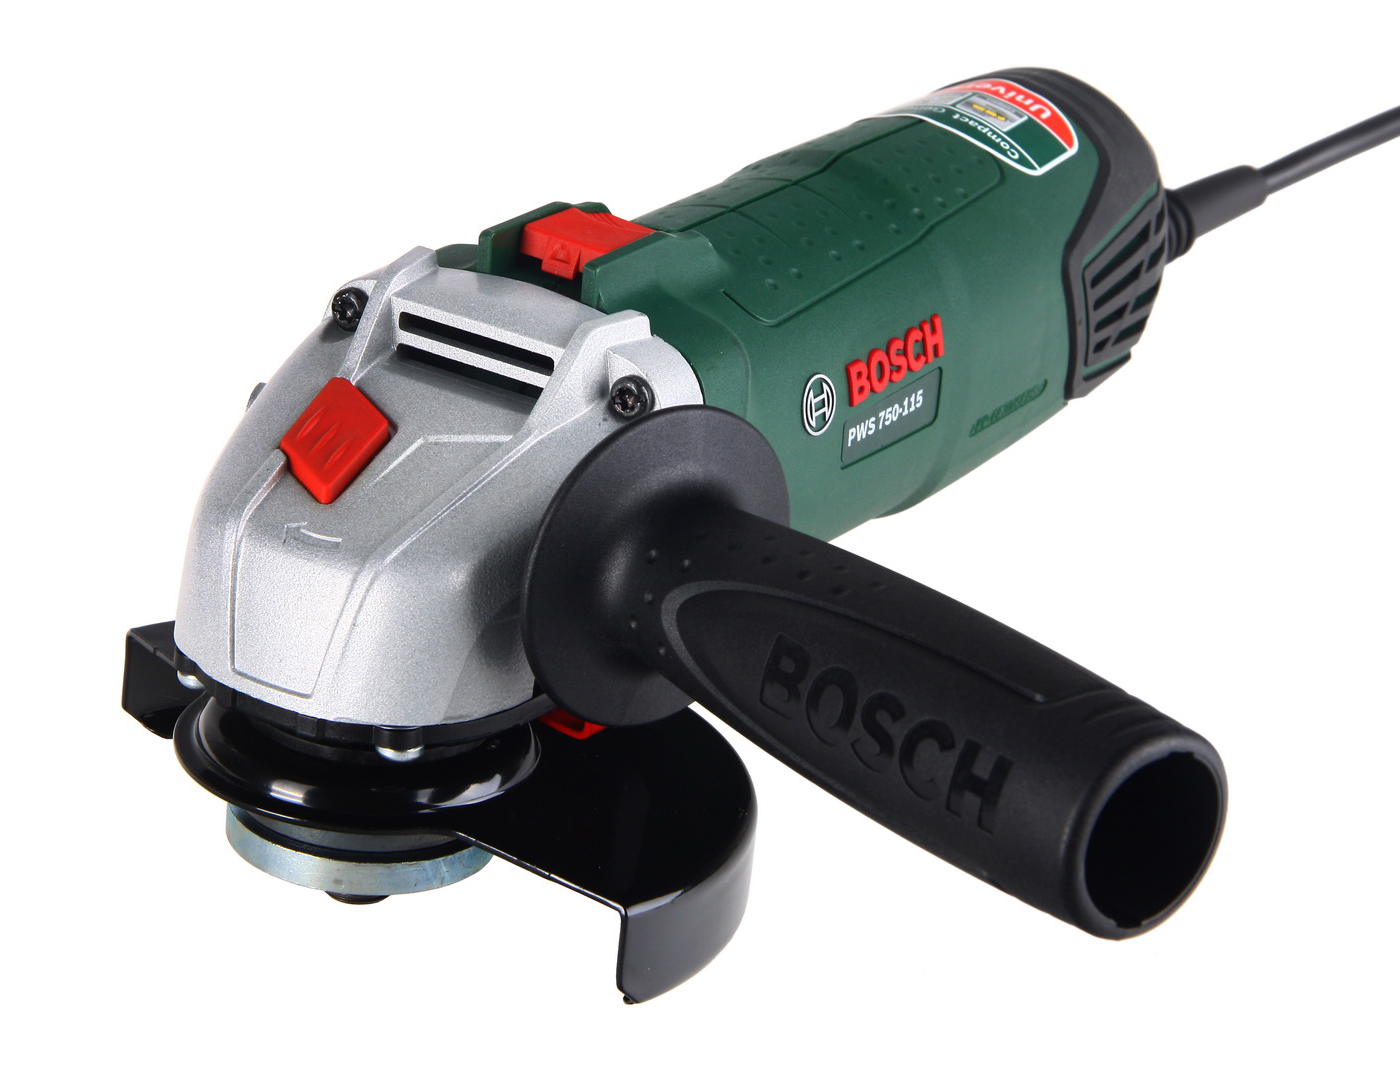 УШМ (болгарка) Bosch Pws 750-115 (0.603.3a2.420) smeg scv 115